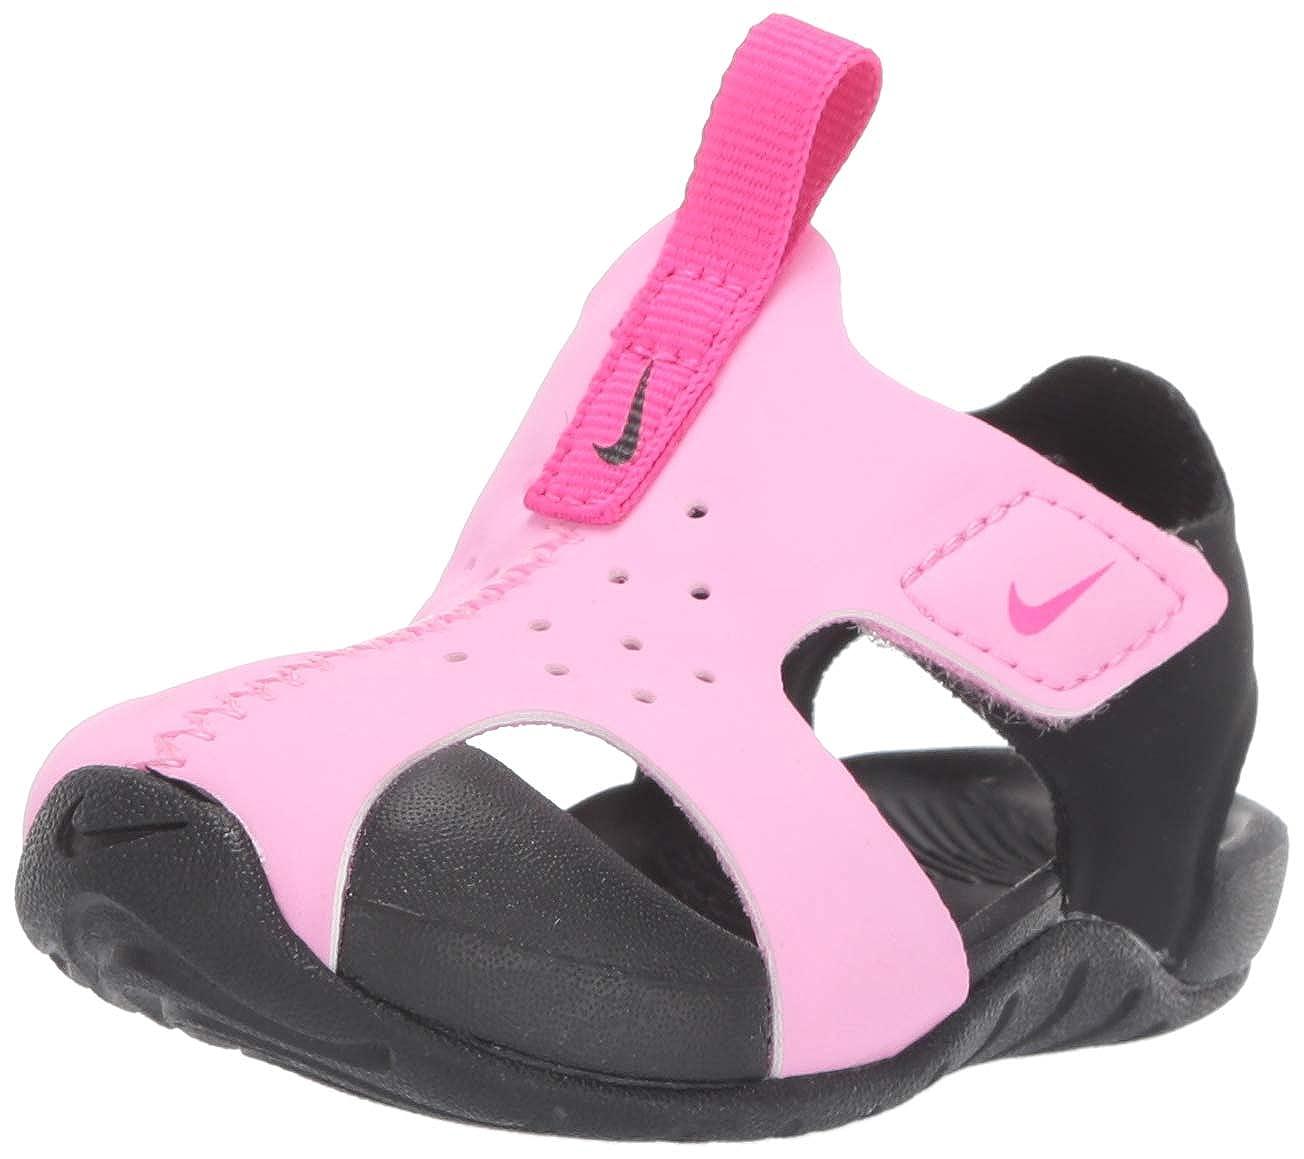 Nike Sandali 0 2 Sunray Protect Bimbi Td Unisex 24 nwO0Pk